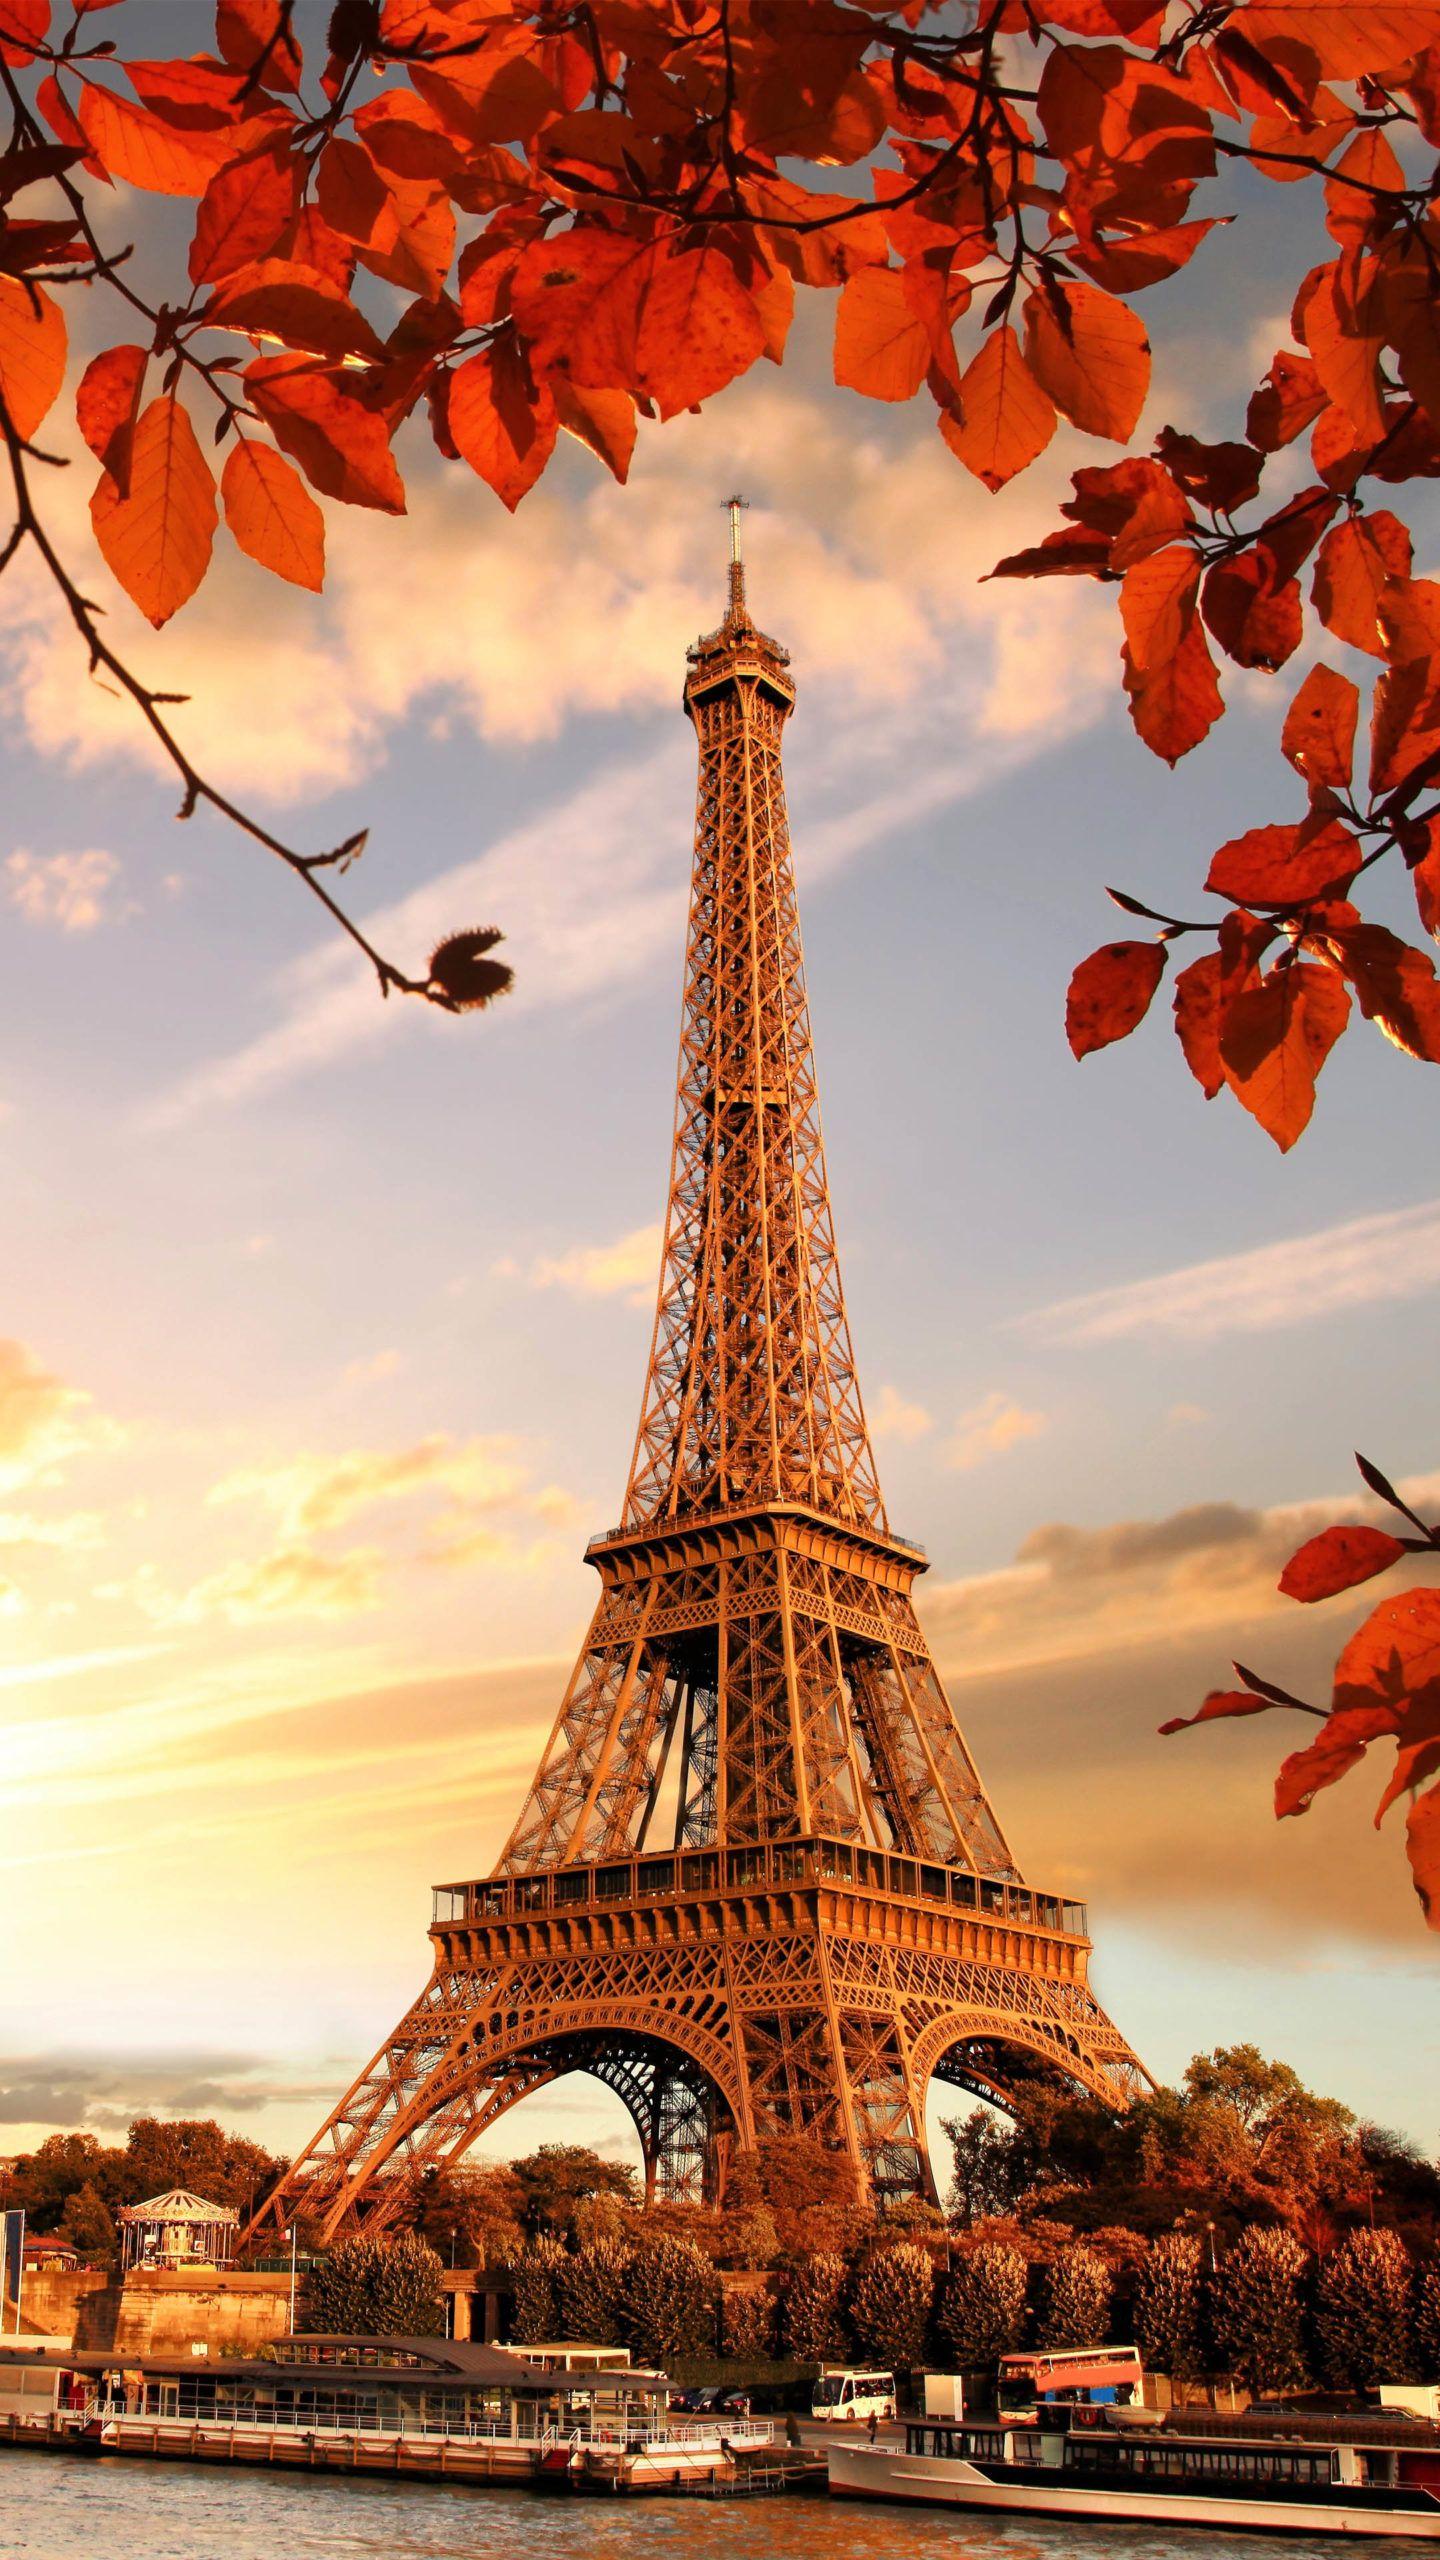 Eiffel Tower Autumn Sunset 4k Ultra Hd Mobile Wallpaper Paris Photography Eiffel Tower Paris Wallpaper Eiffel Tower Photography